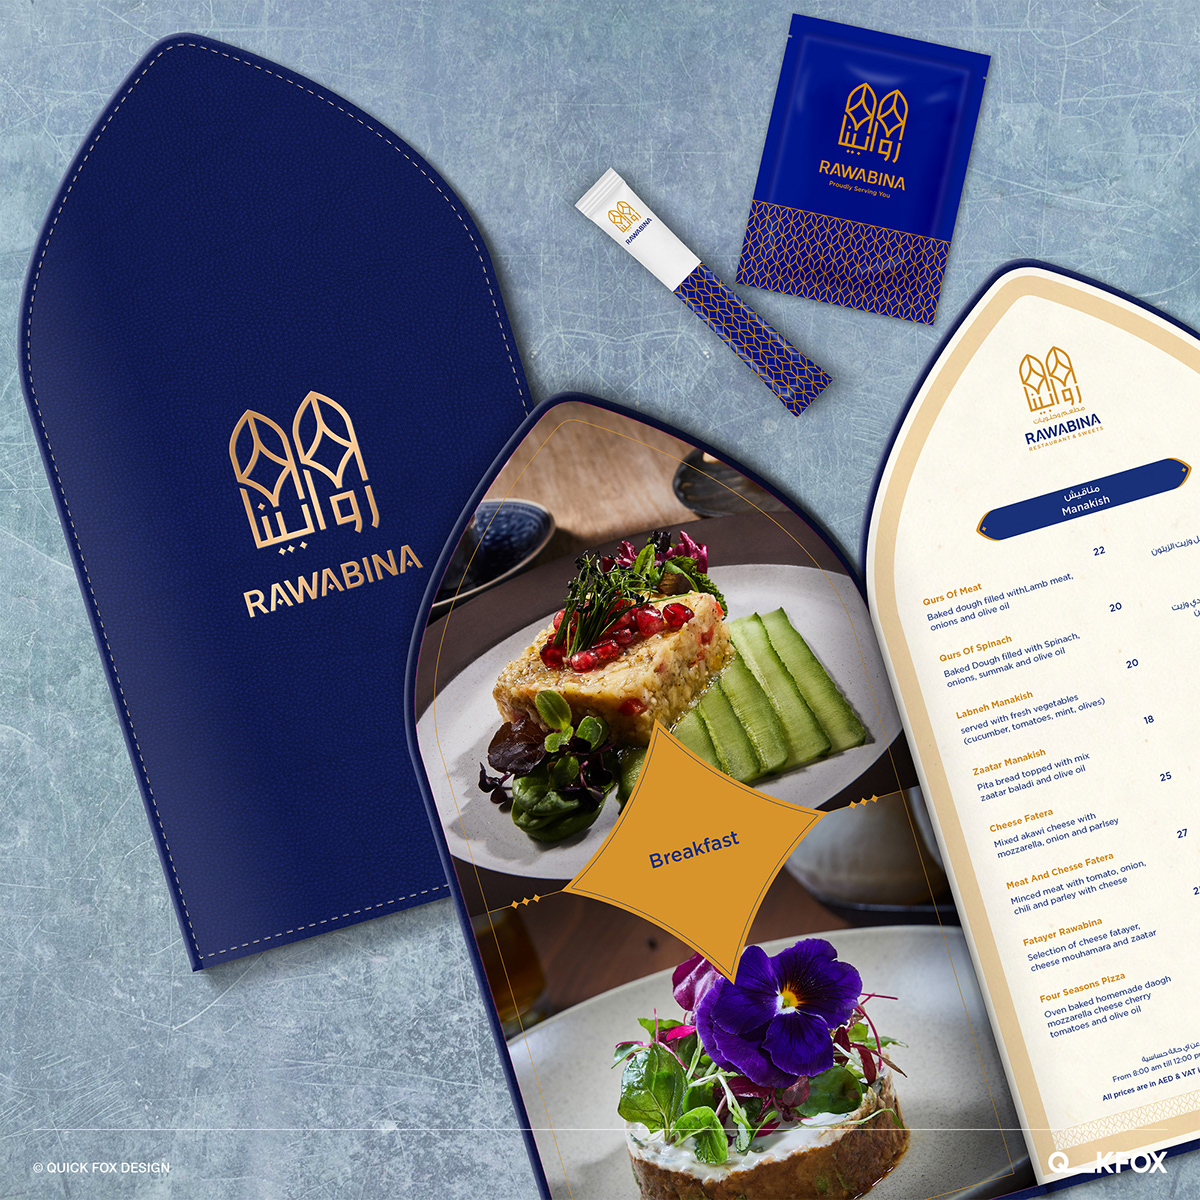 Image may contain: table, food and menu